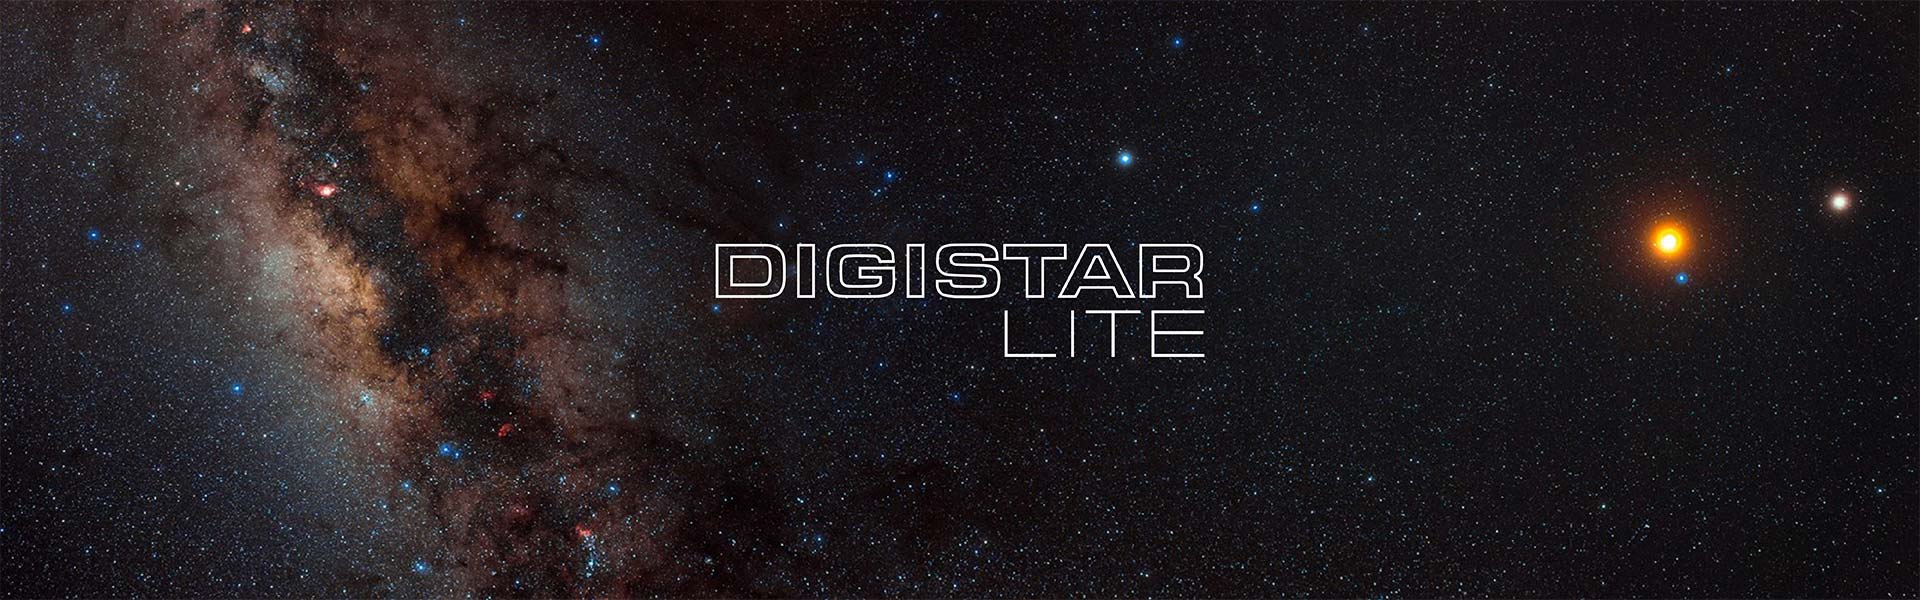 Digistar Lite logo